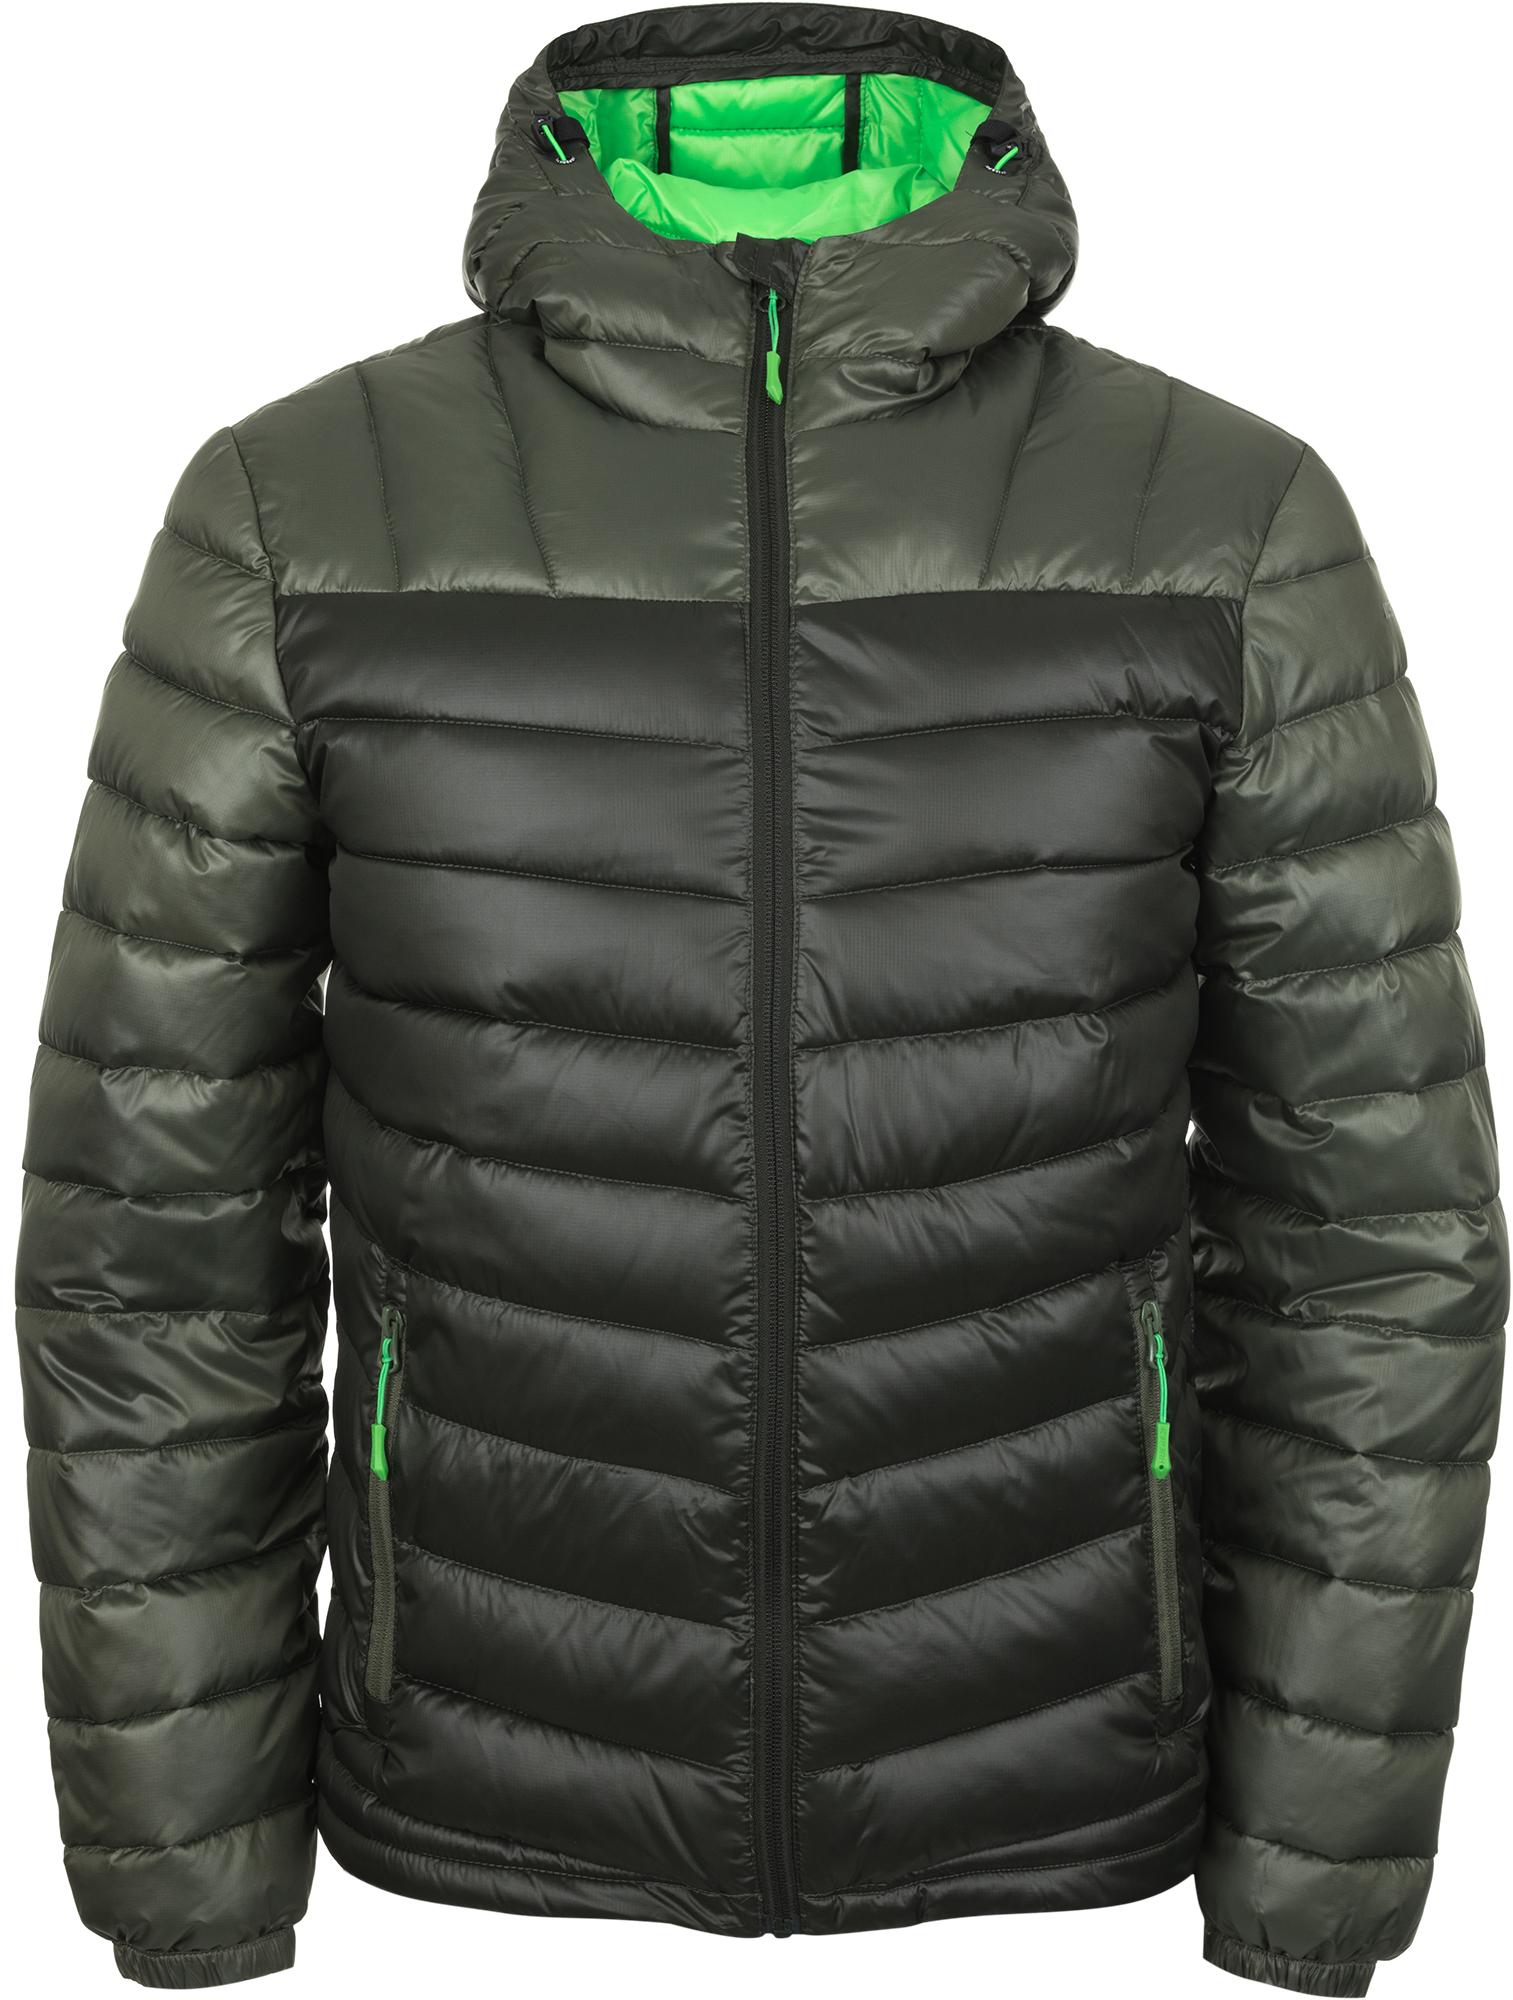 IcePeak Куртка утепленная мужская IcePeak Leal, размер 48